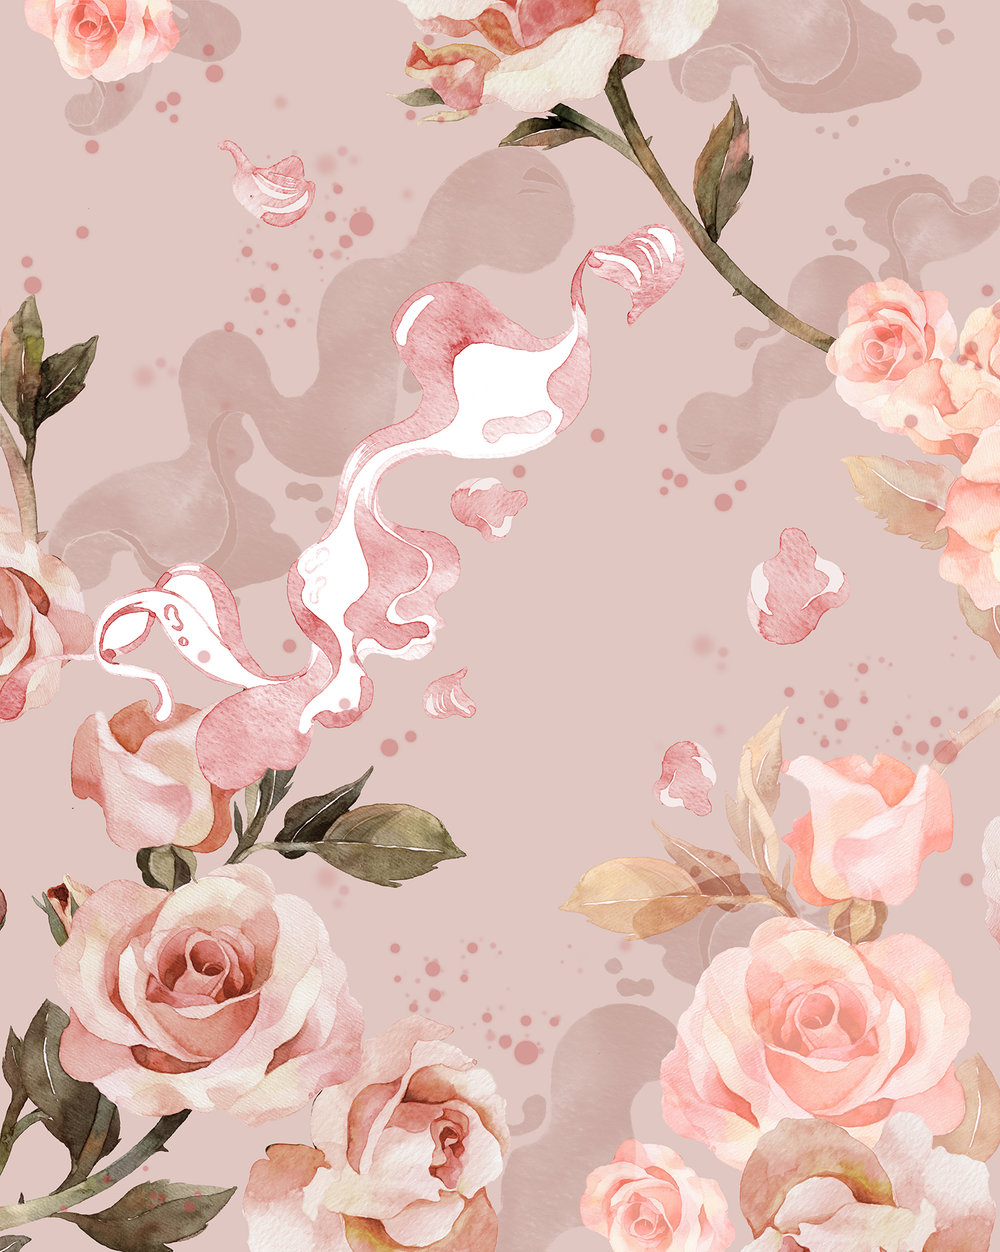 PommeChan_Pattern_Rose_Pink_20x20.jpg